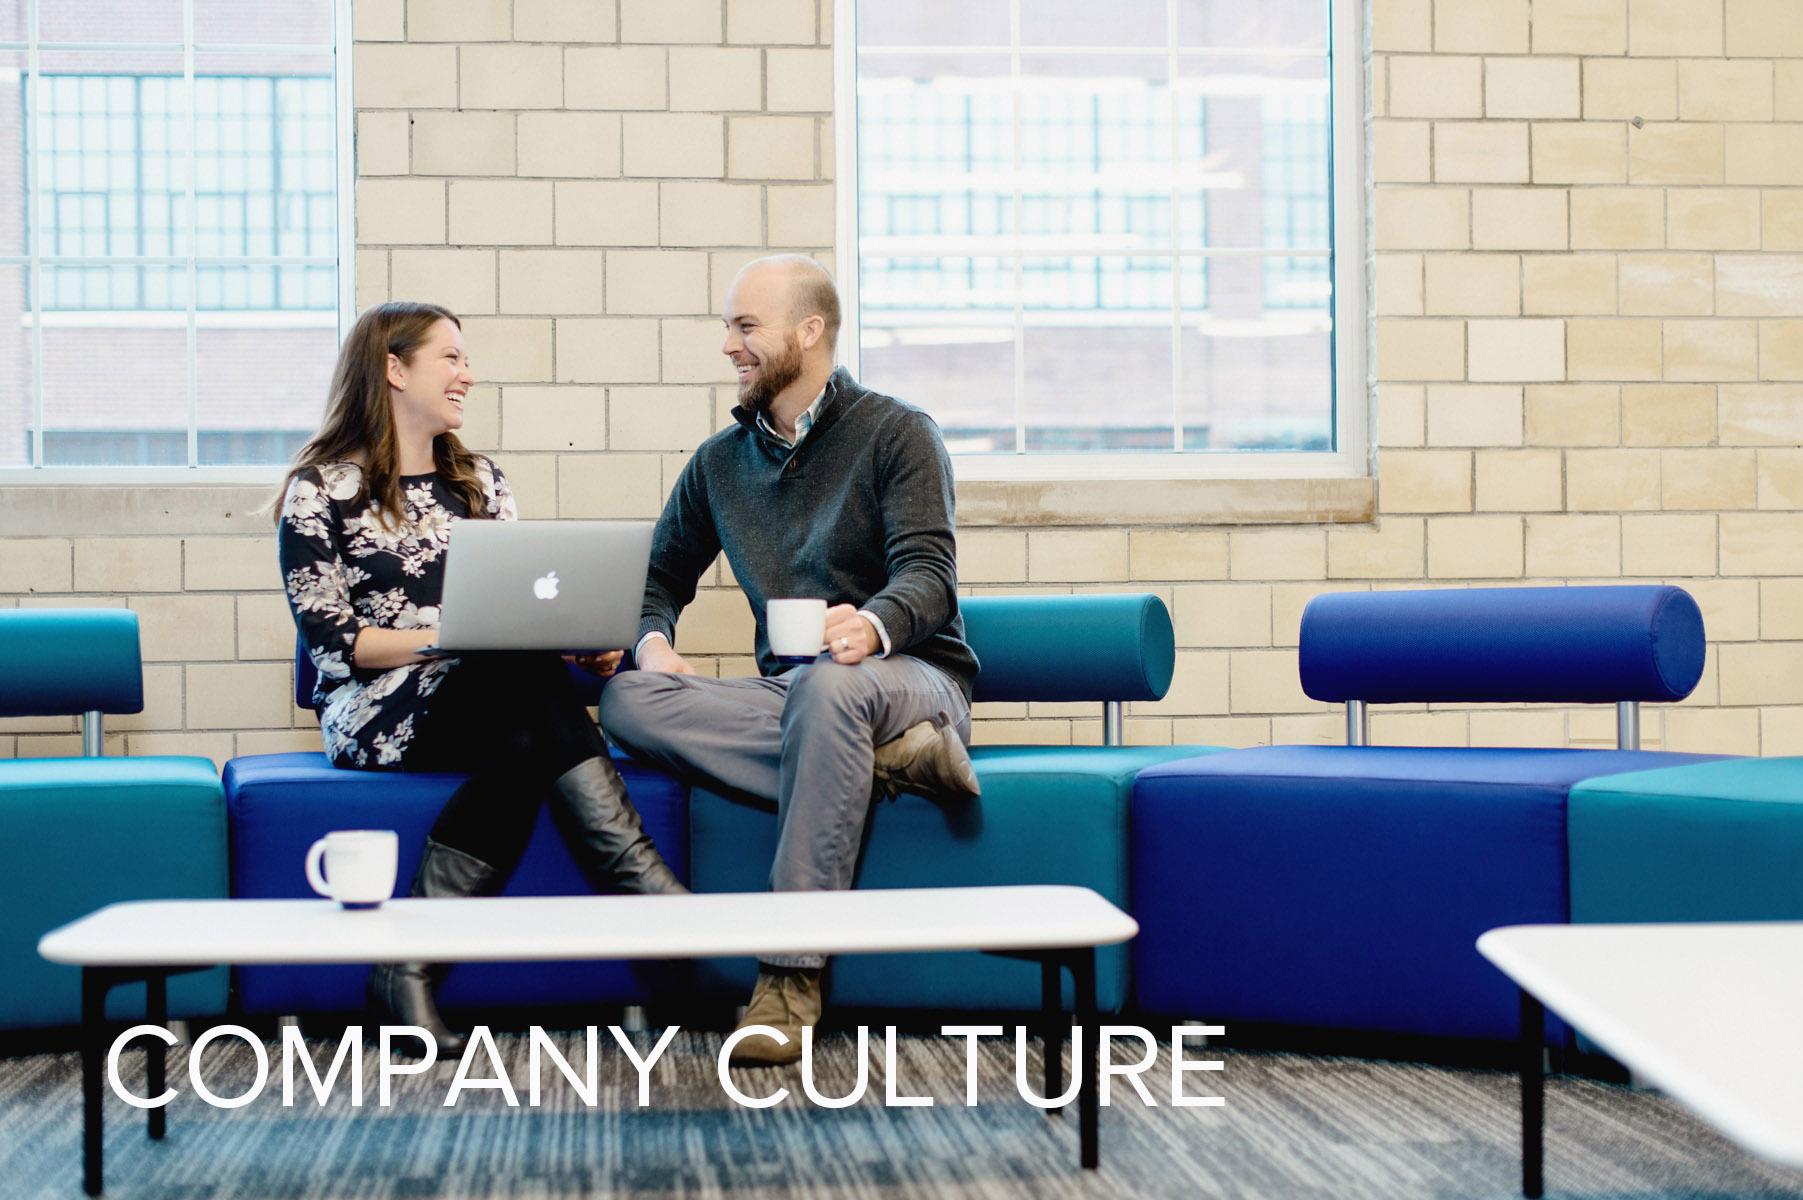 Company-culture-112.jpg